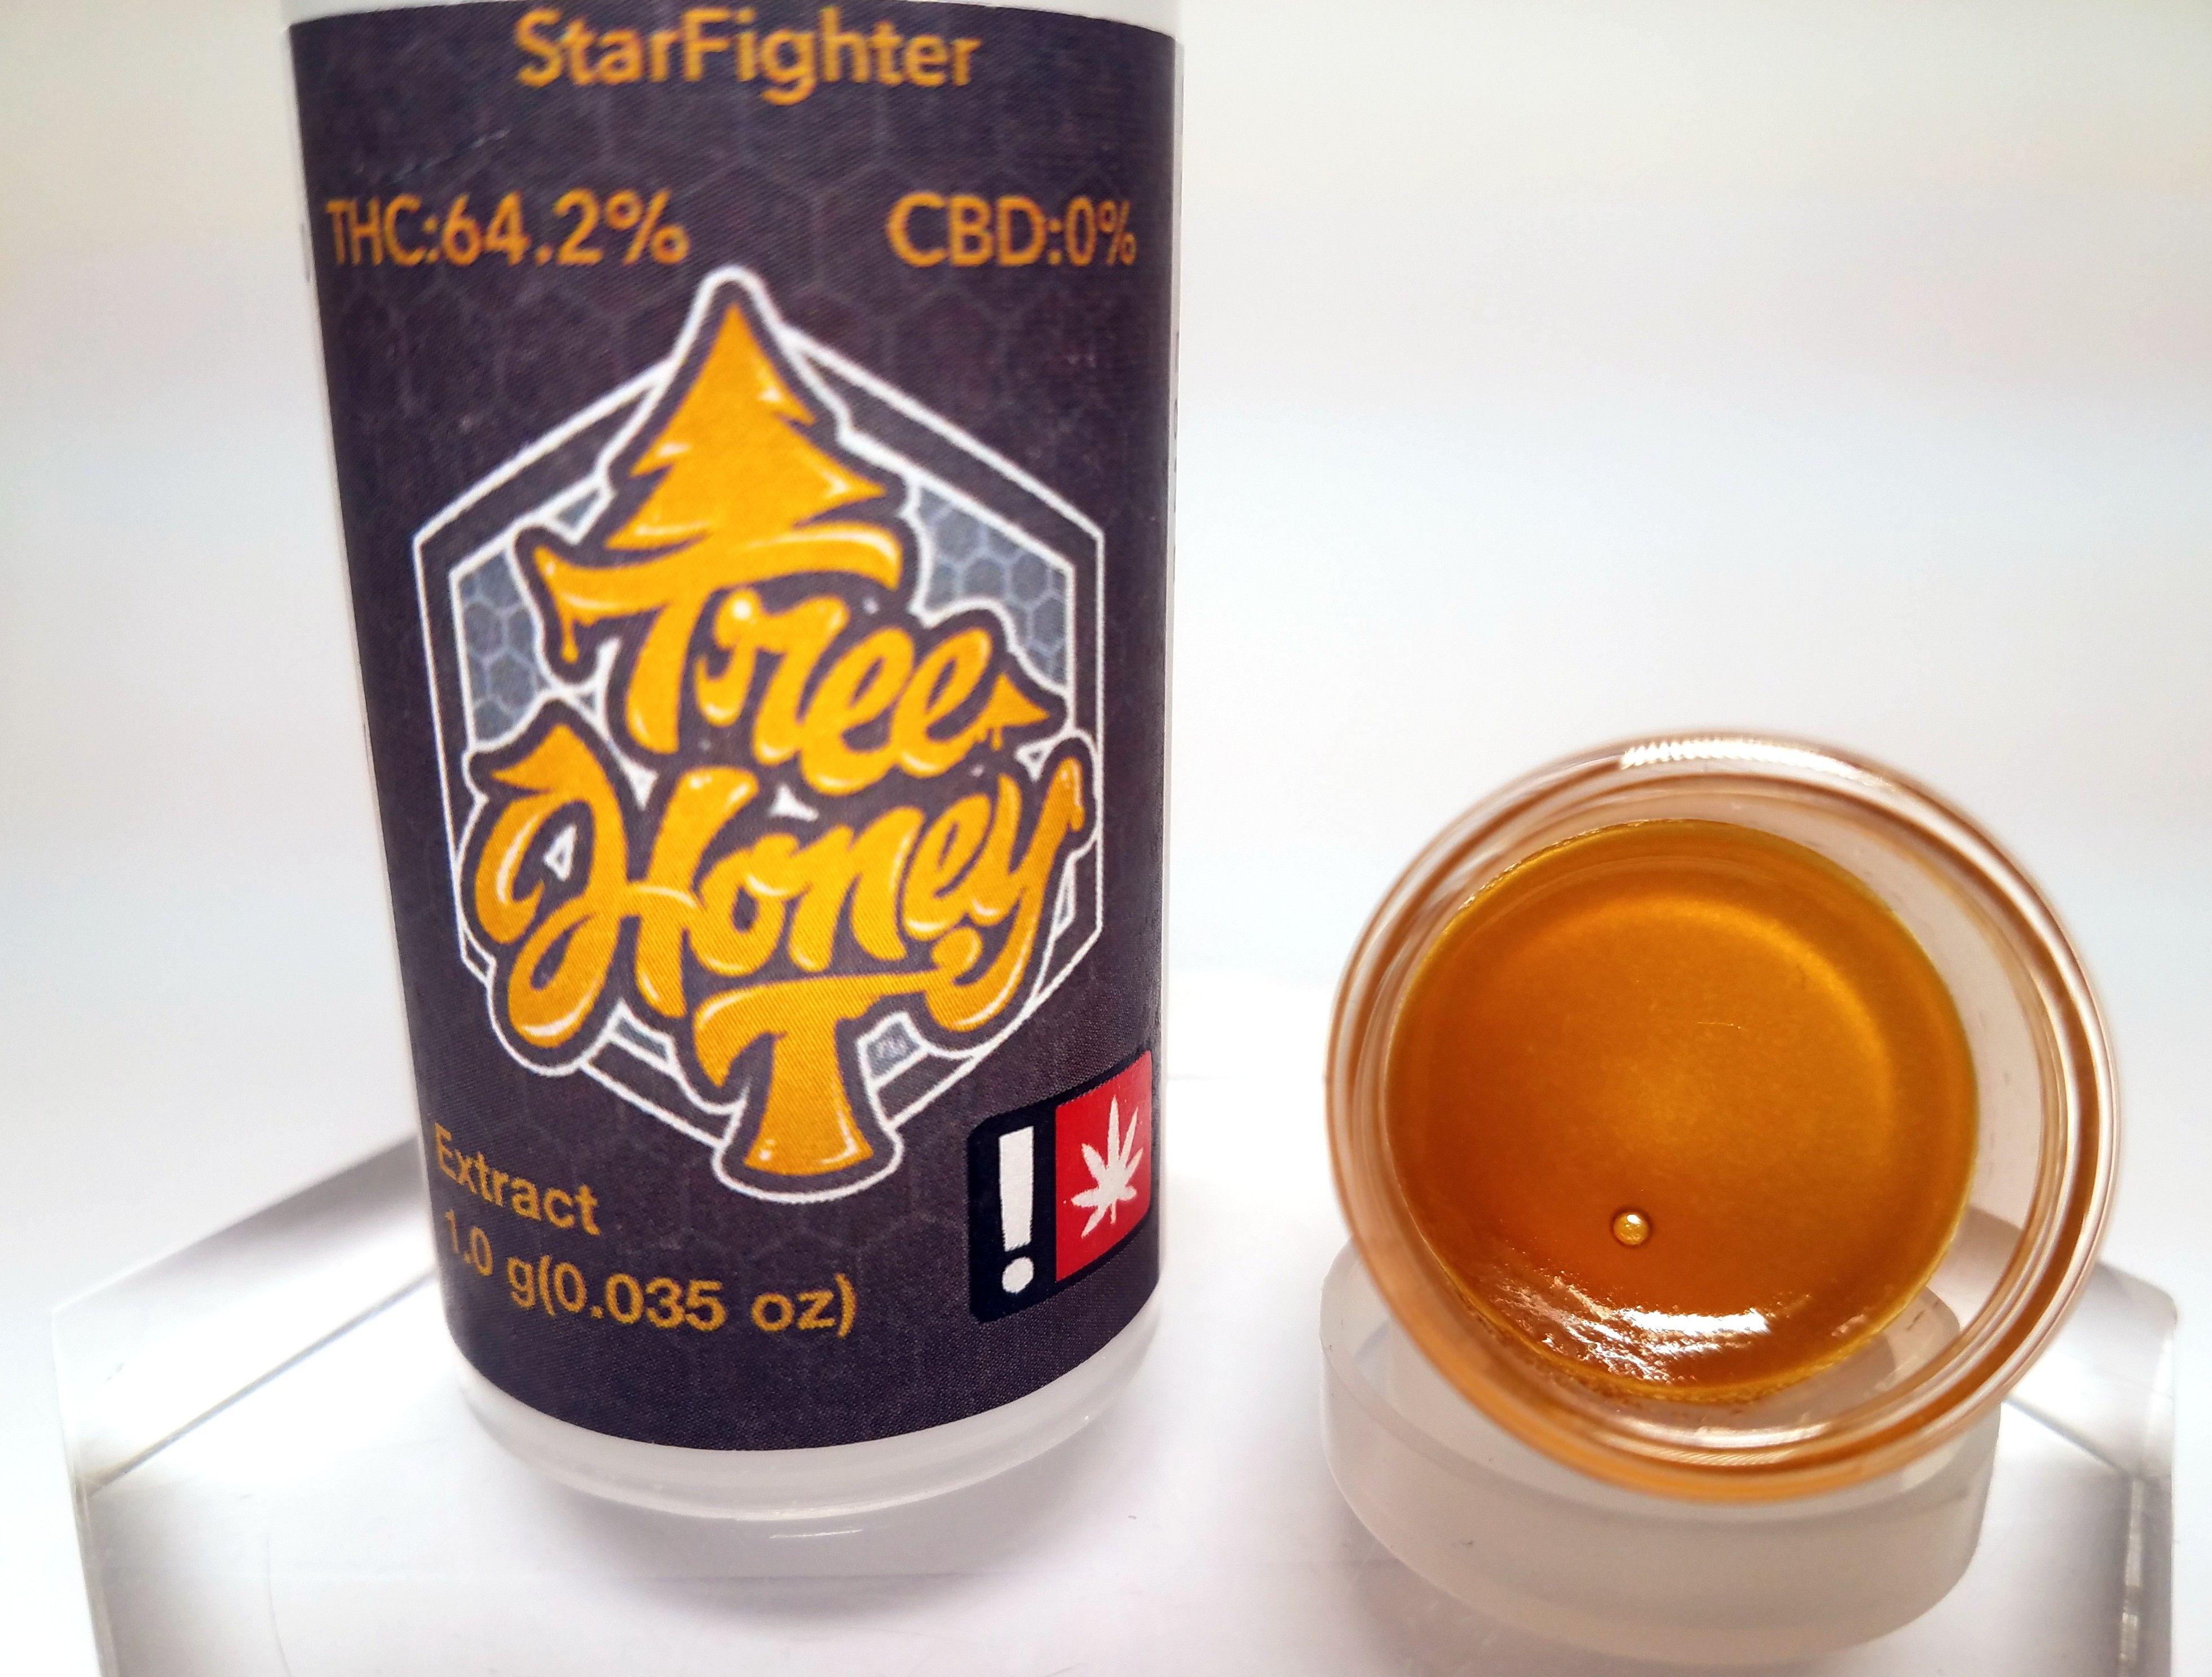 Tree Honey - Starfighter, Indica Hybrid, Sugar wax